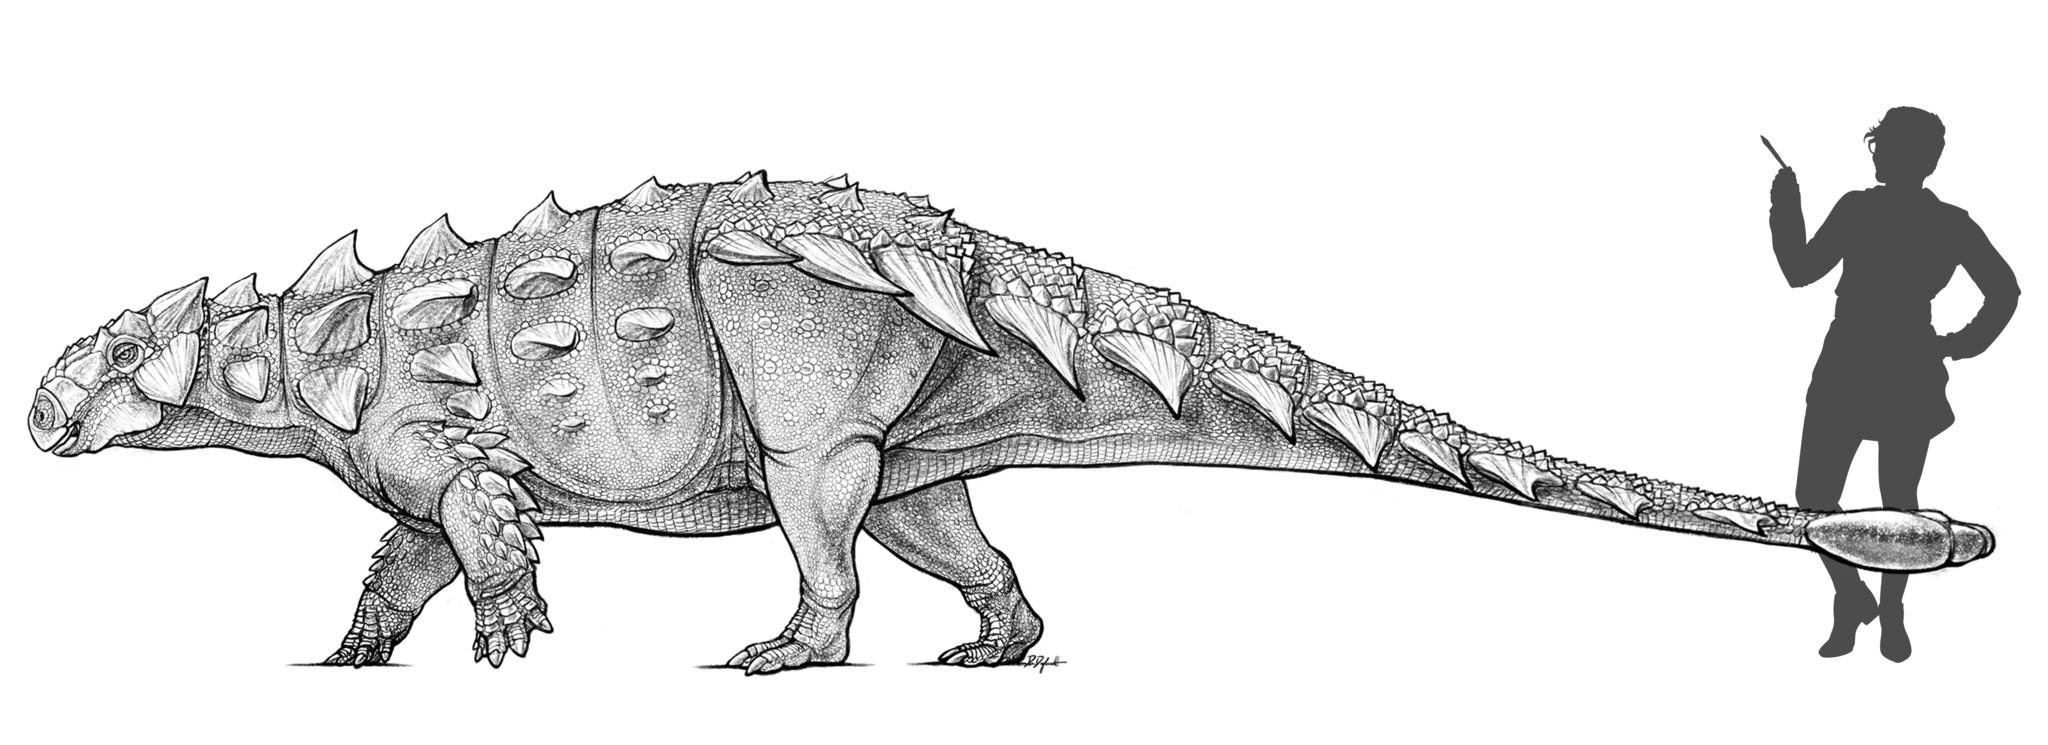 Size comparison of Zuul crurivastator and a modern human.